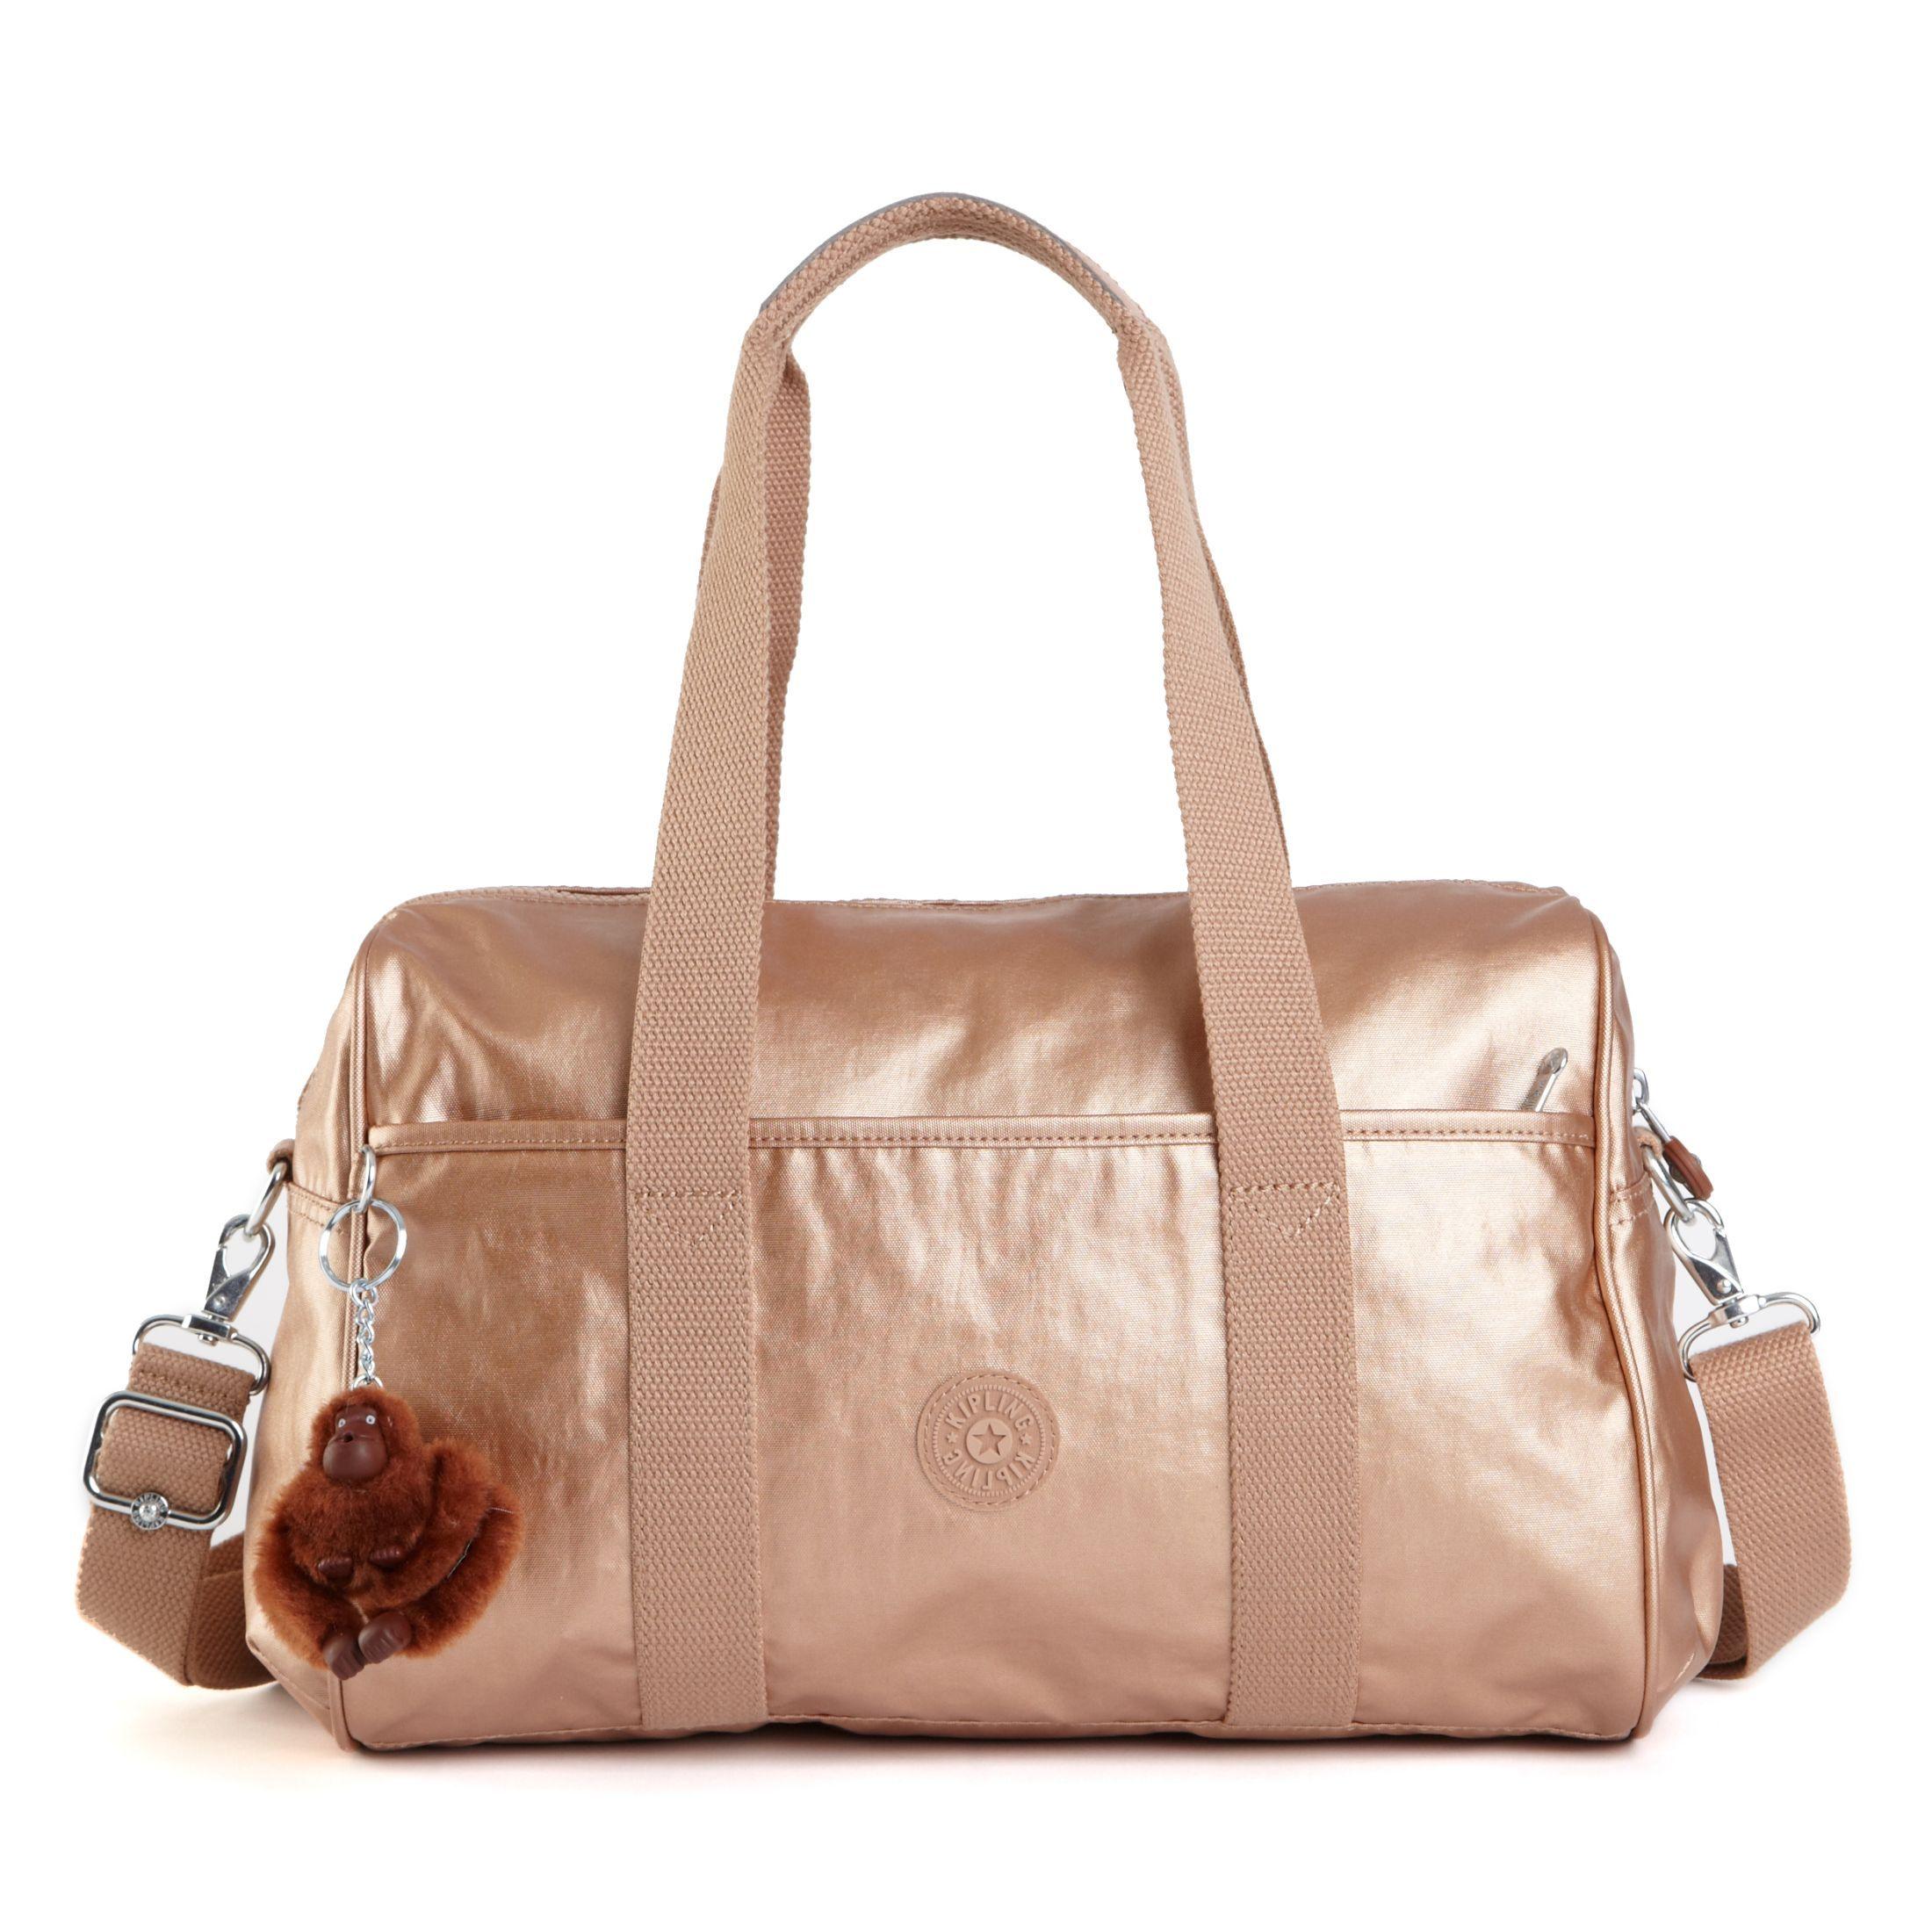 Practicool Metallic Handbag